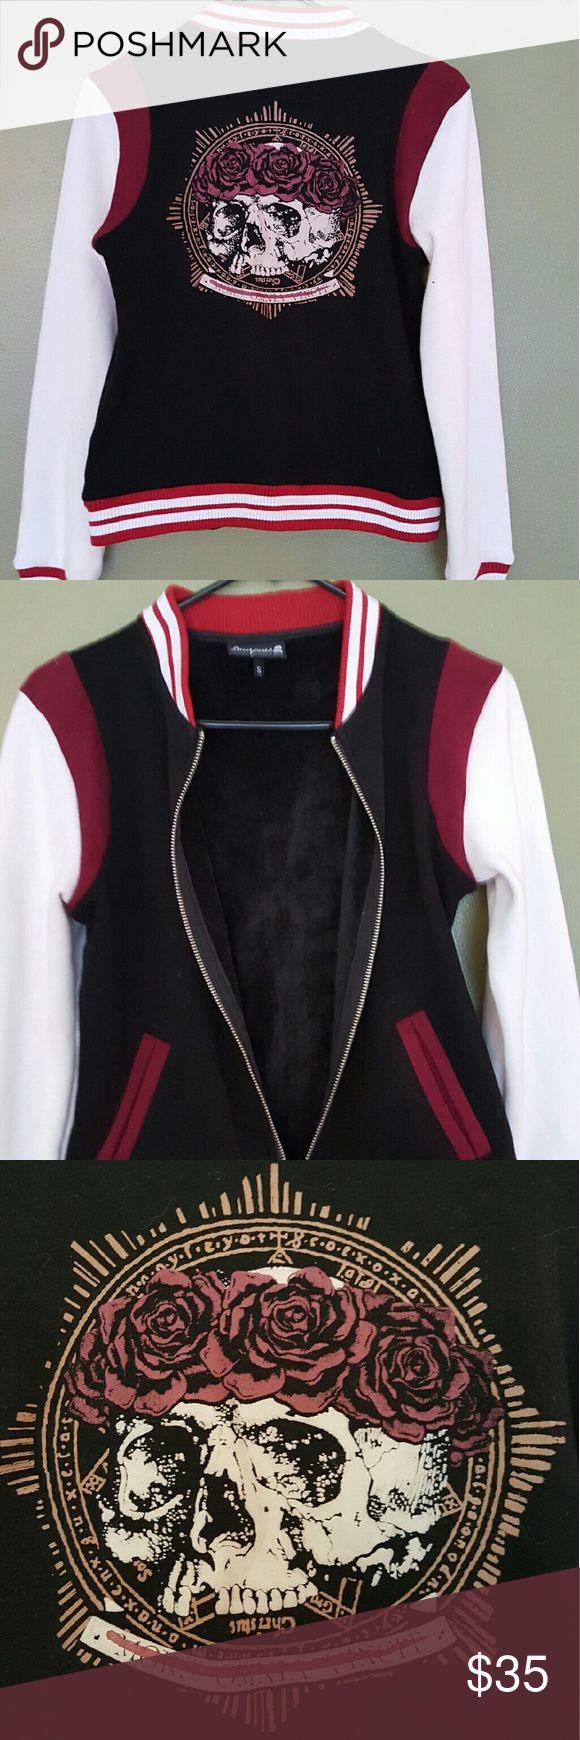 "Sourpuss varsity letterman jacket Crimson skull Like new, Sourpuss jacket. Says ""crimson"" skull with head band of roses size small Sourpuss Jackets & Coats"